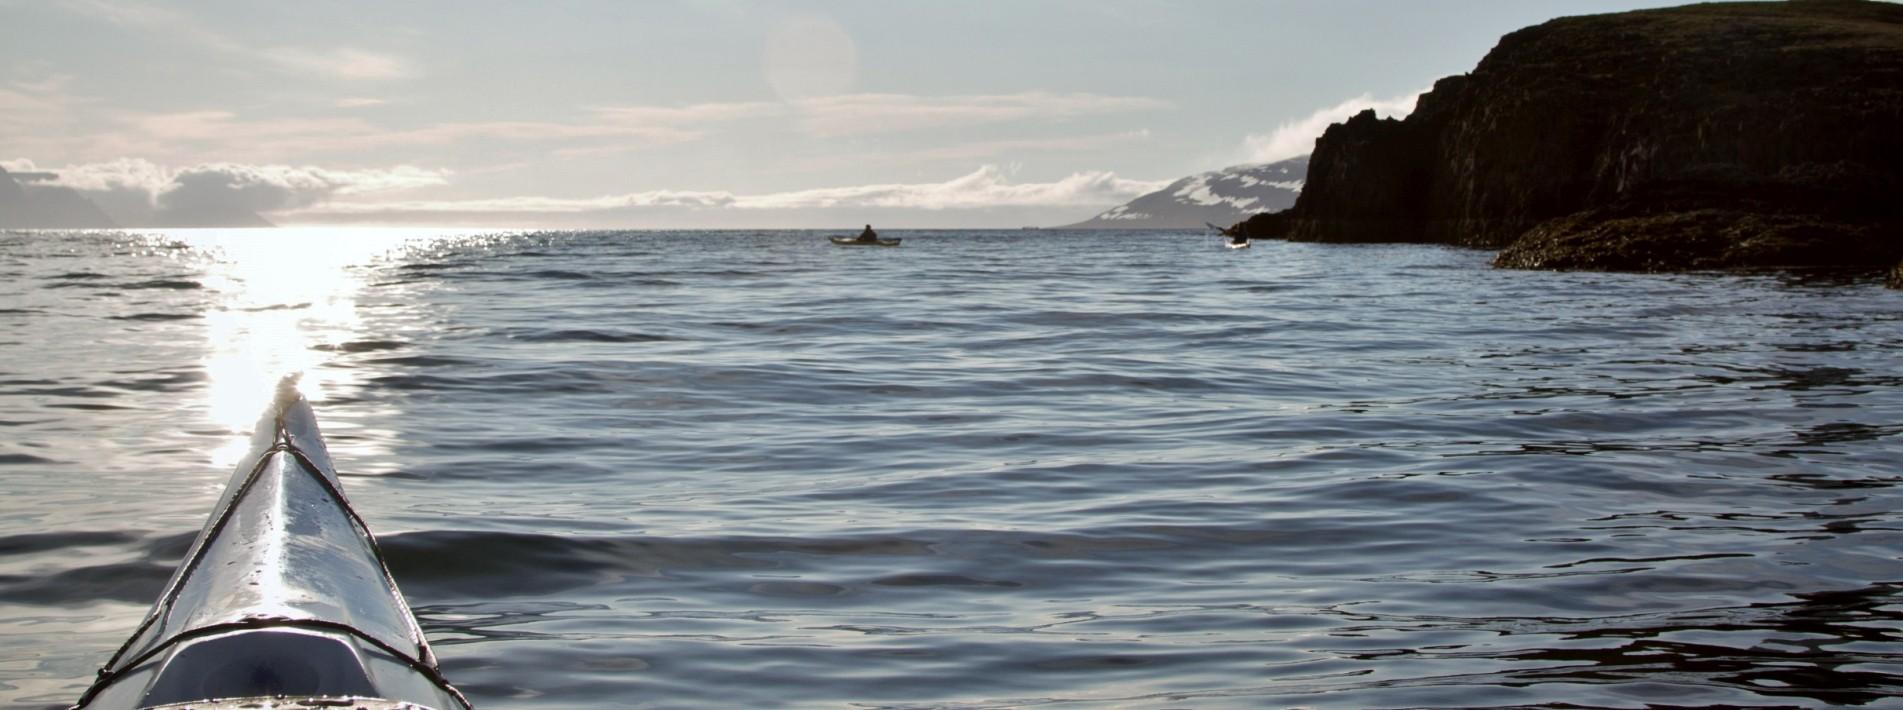 Kajak fahren: Islands unberührte Natur